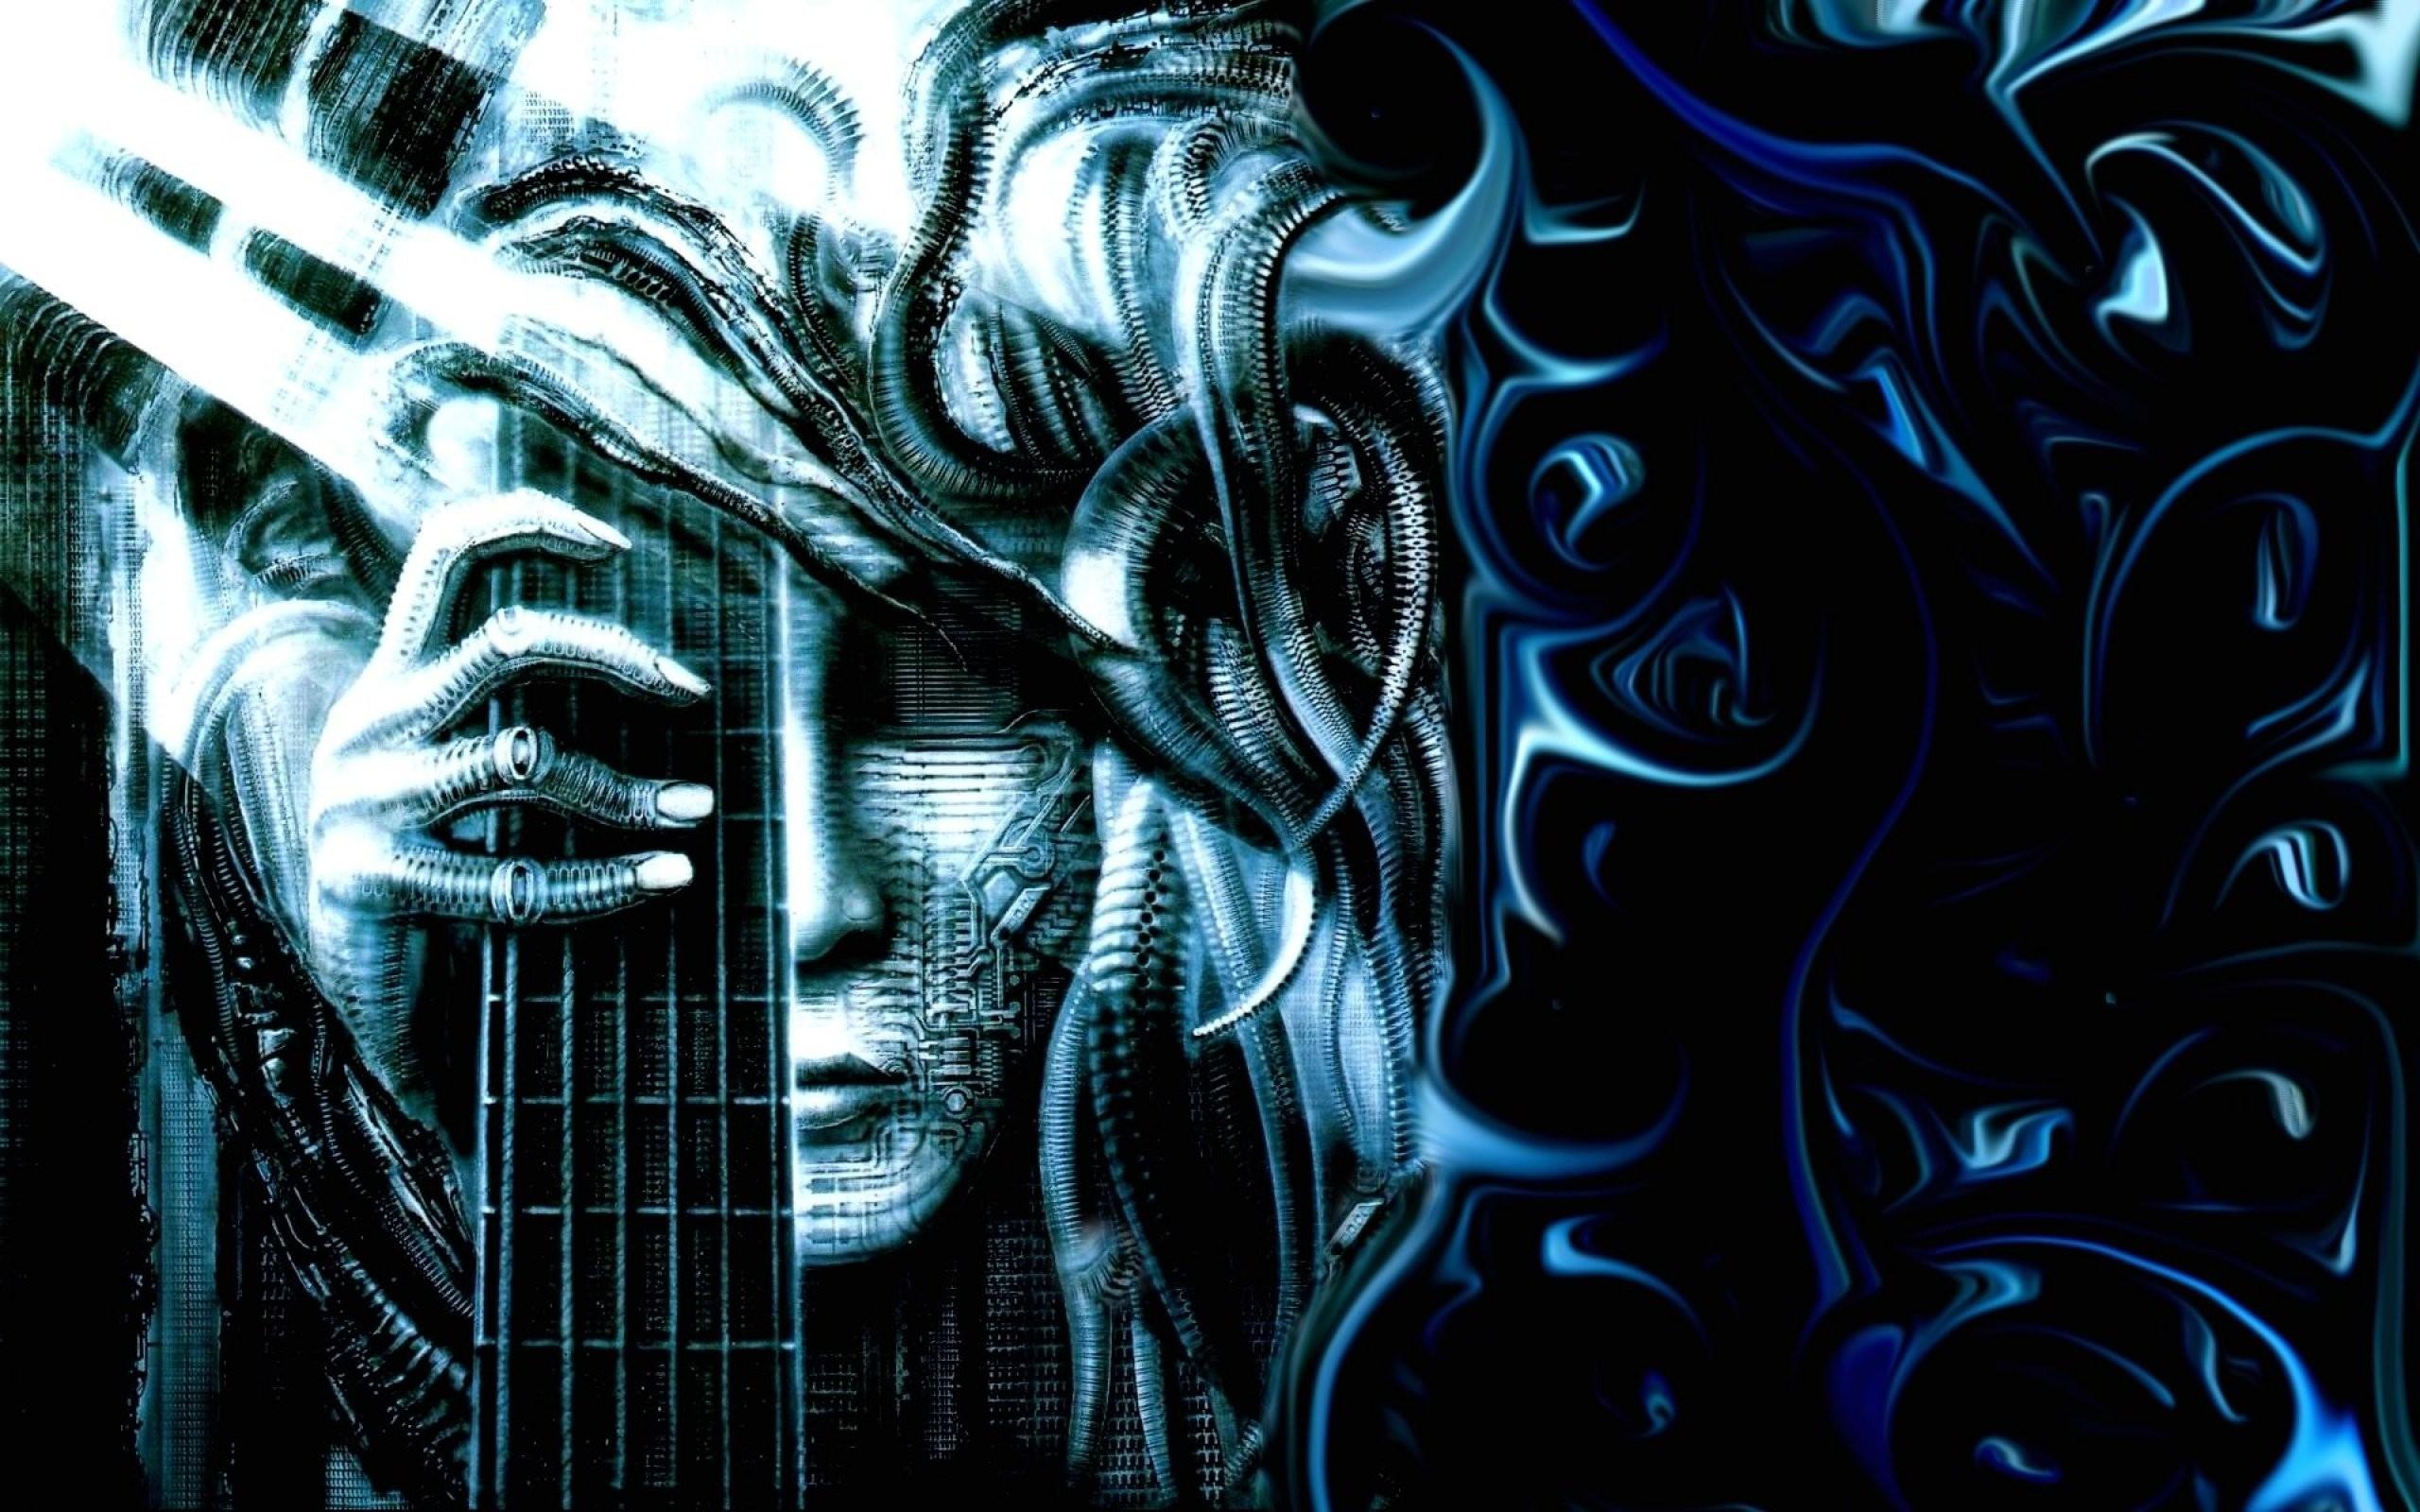 Heavy metal backgrounds